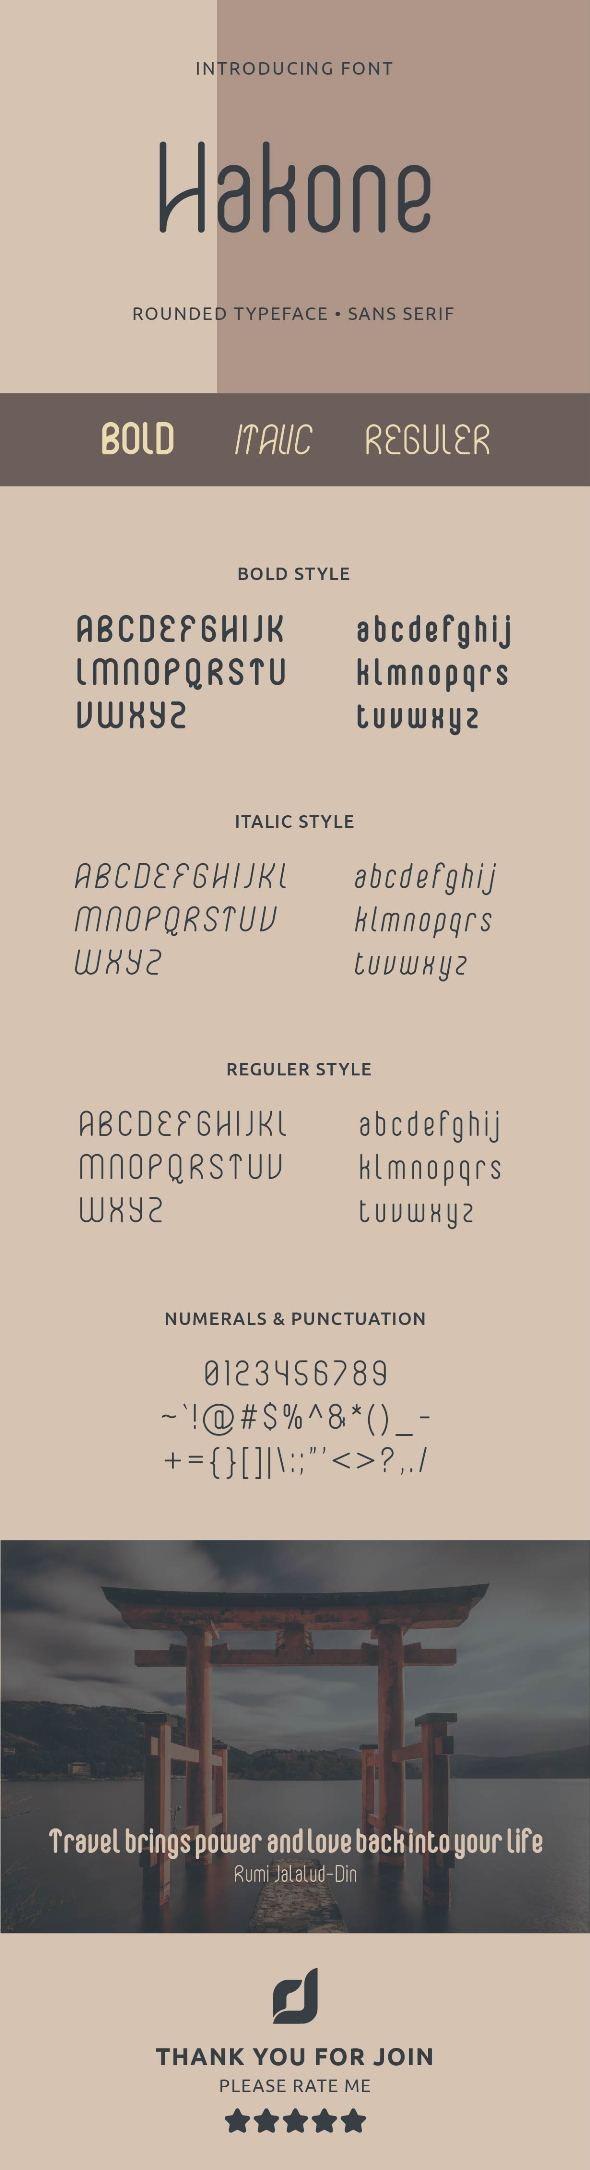 Hakone Sans Serif - Condensed Sans-Serif